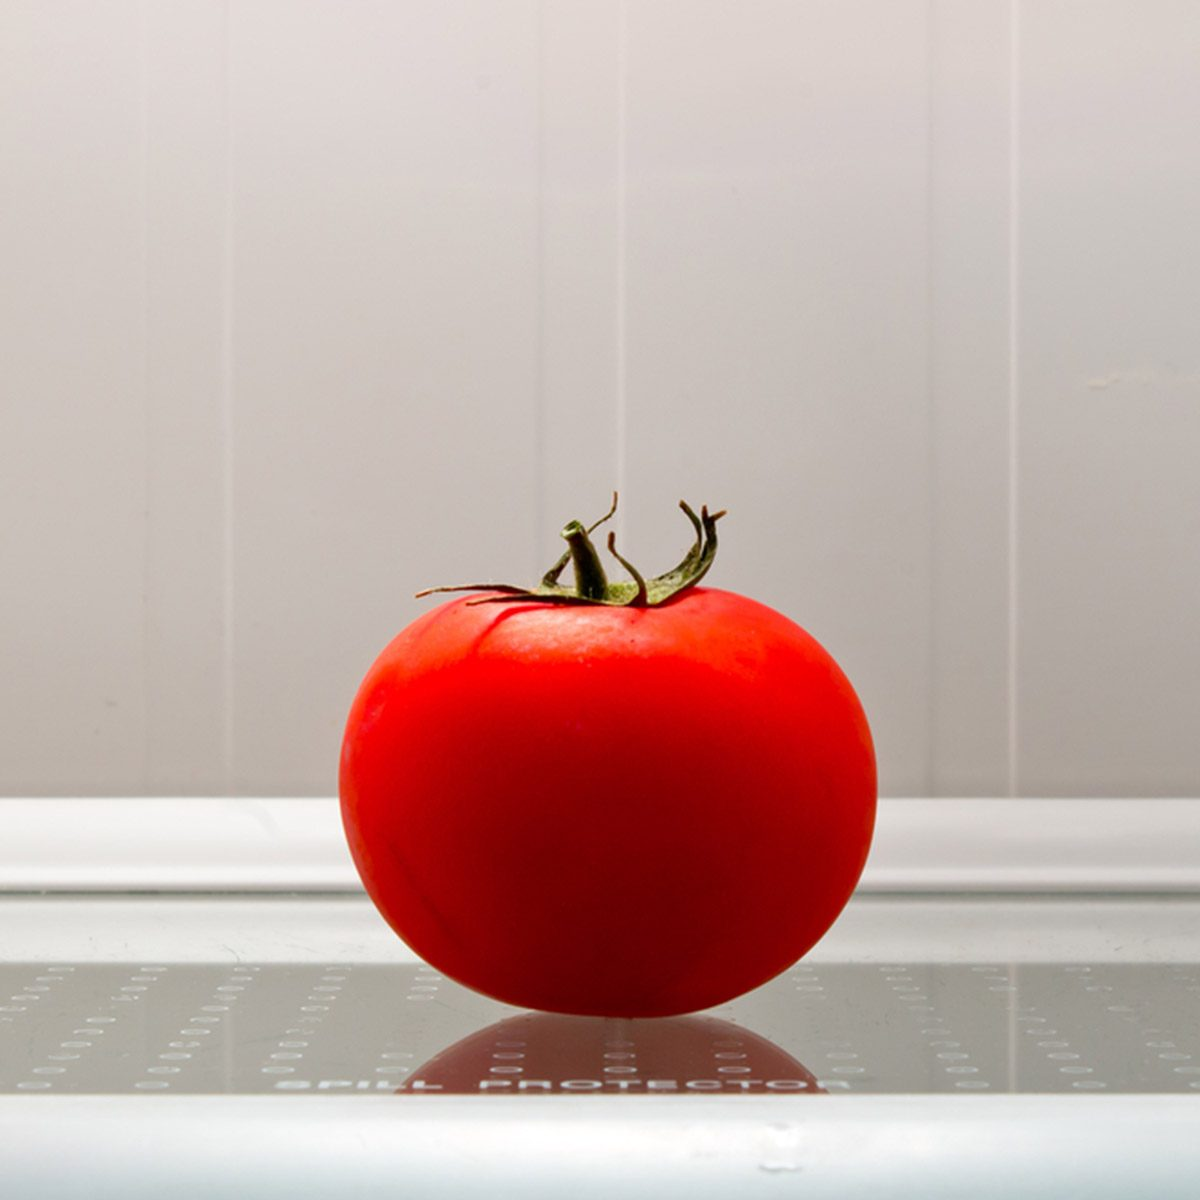 tomato in the fridge; Shutterstock ID 424376923; Job (TFH, TOH, RD, BNB, CWM, CM): Taste of Home